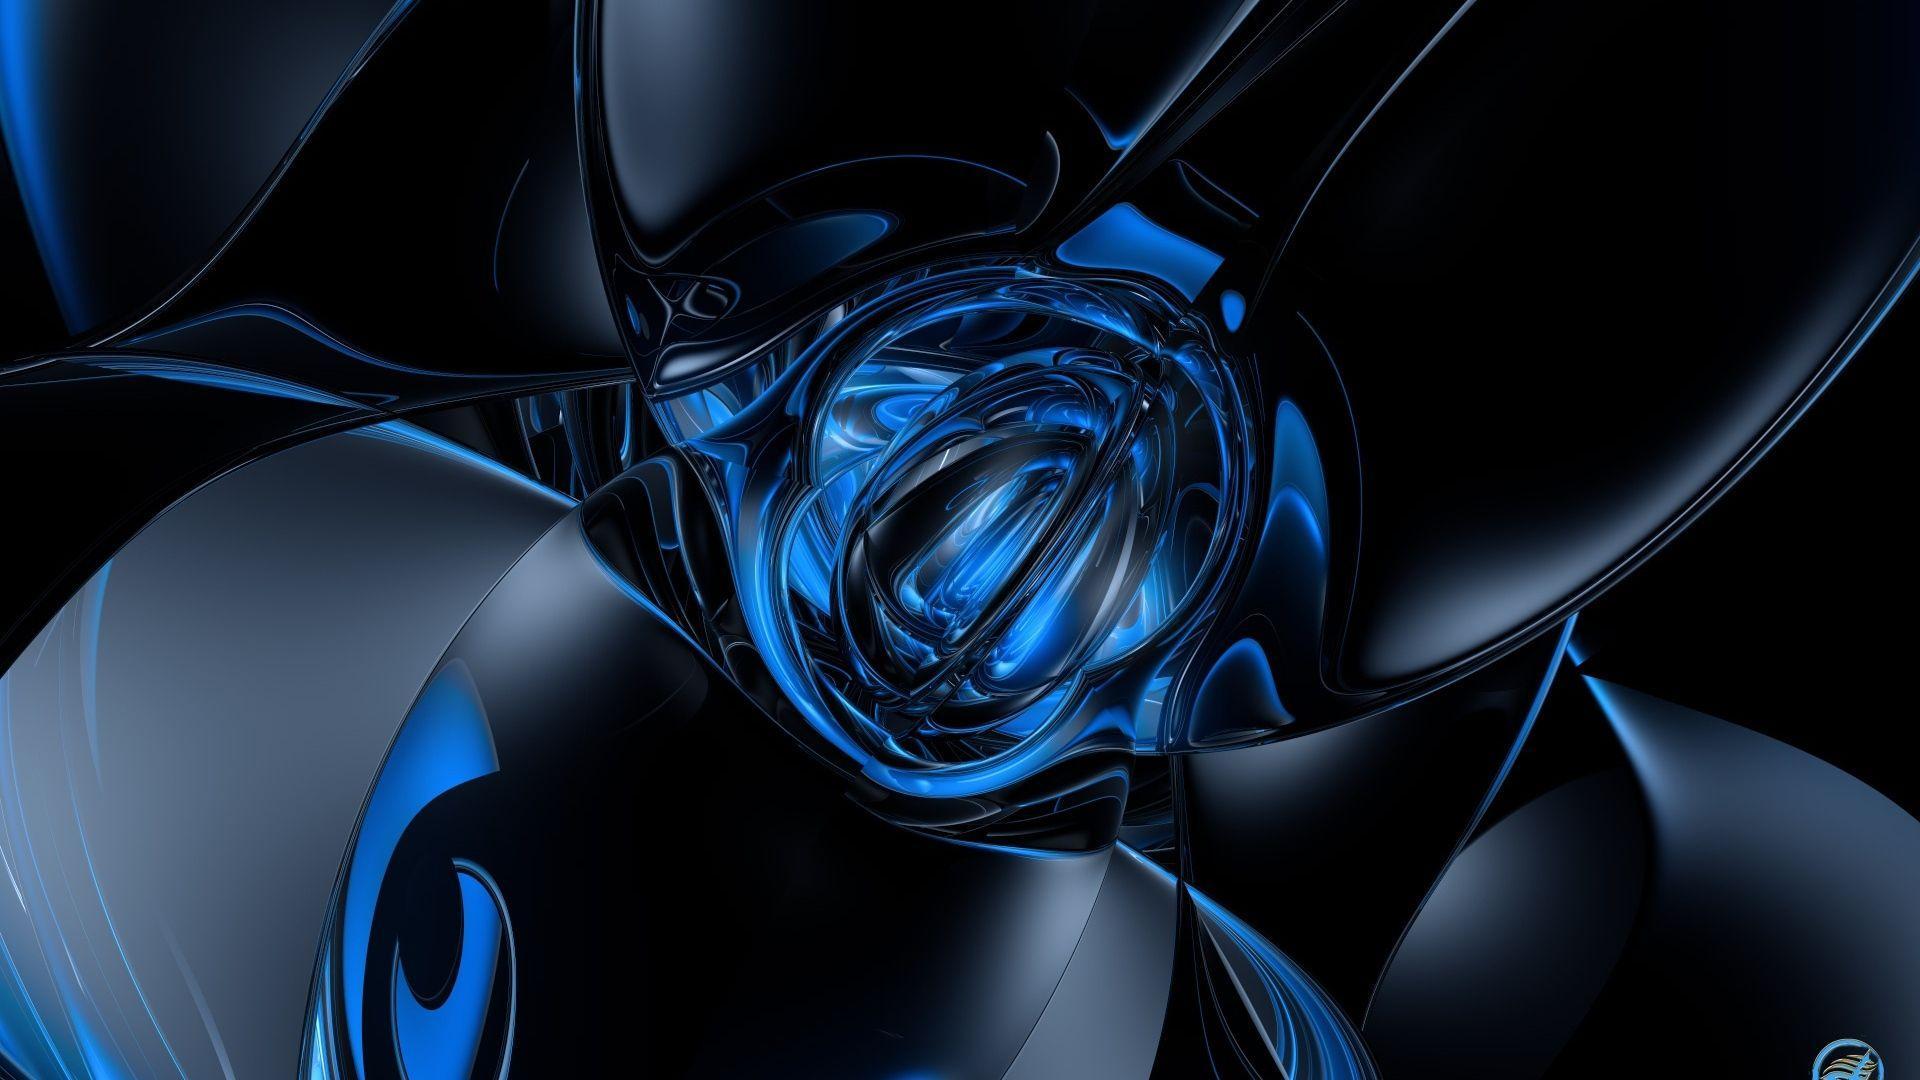 Hd Wallpapers 1920x1080 Black Blue Wallpaper Cave